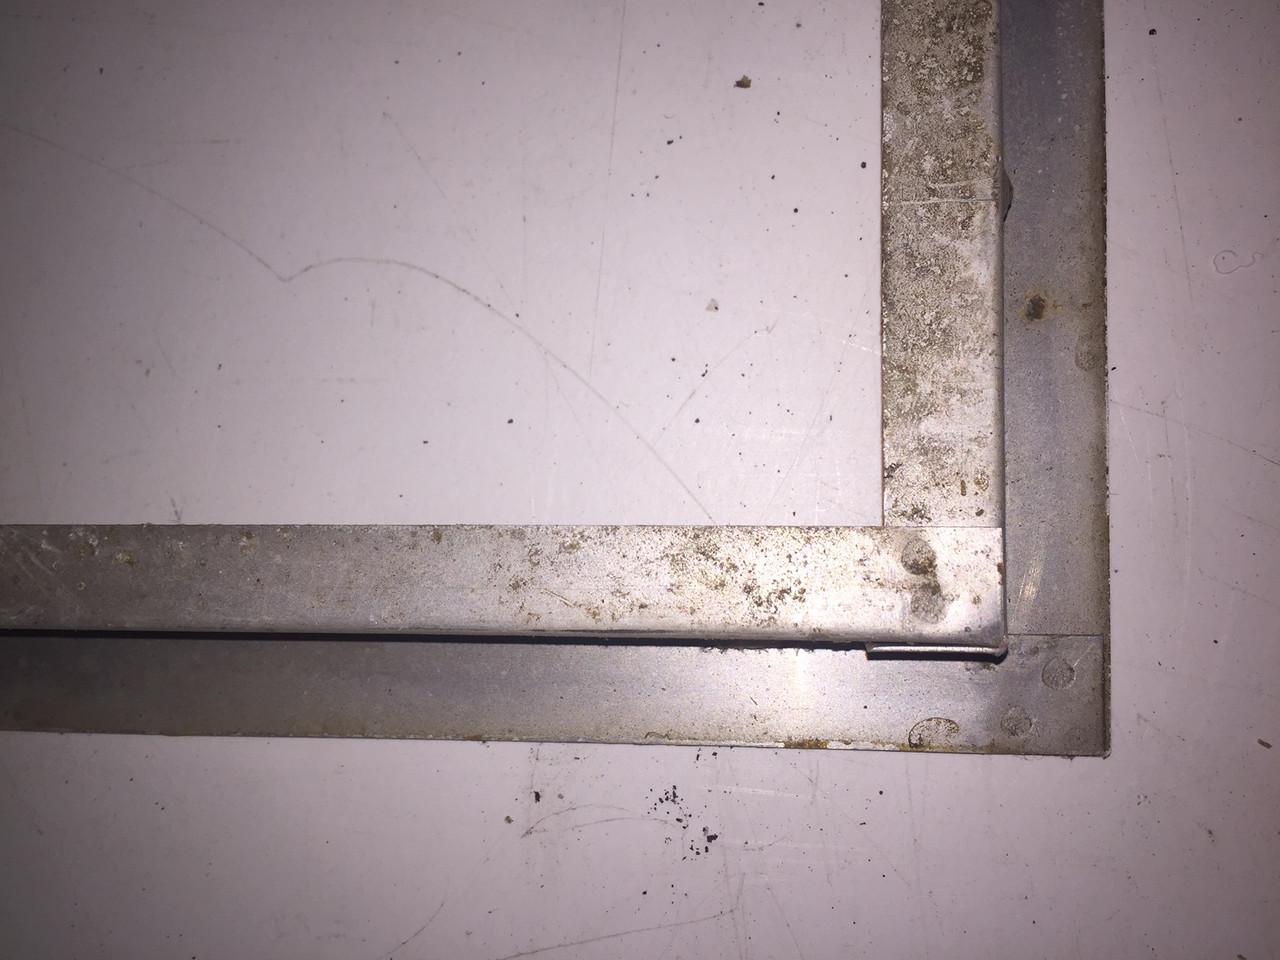 "12-15/16"" x 31-5/16"" Hehr Style Window"